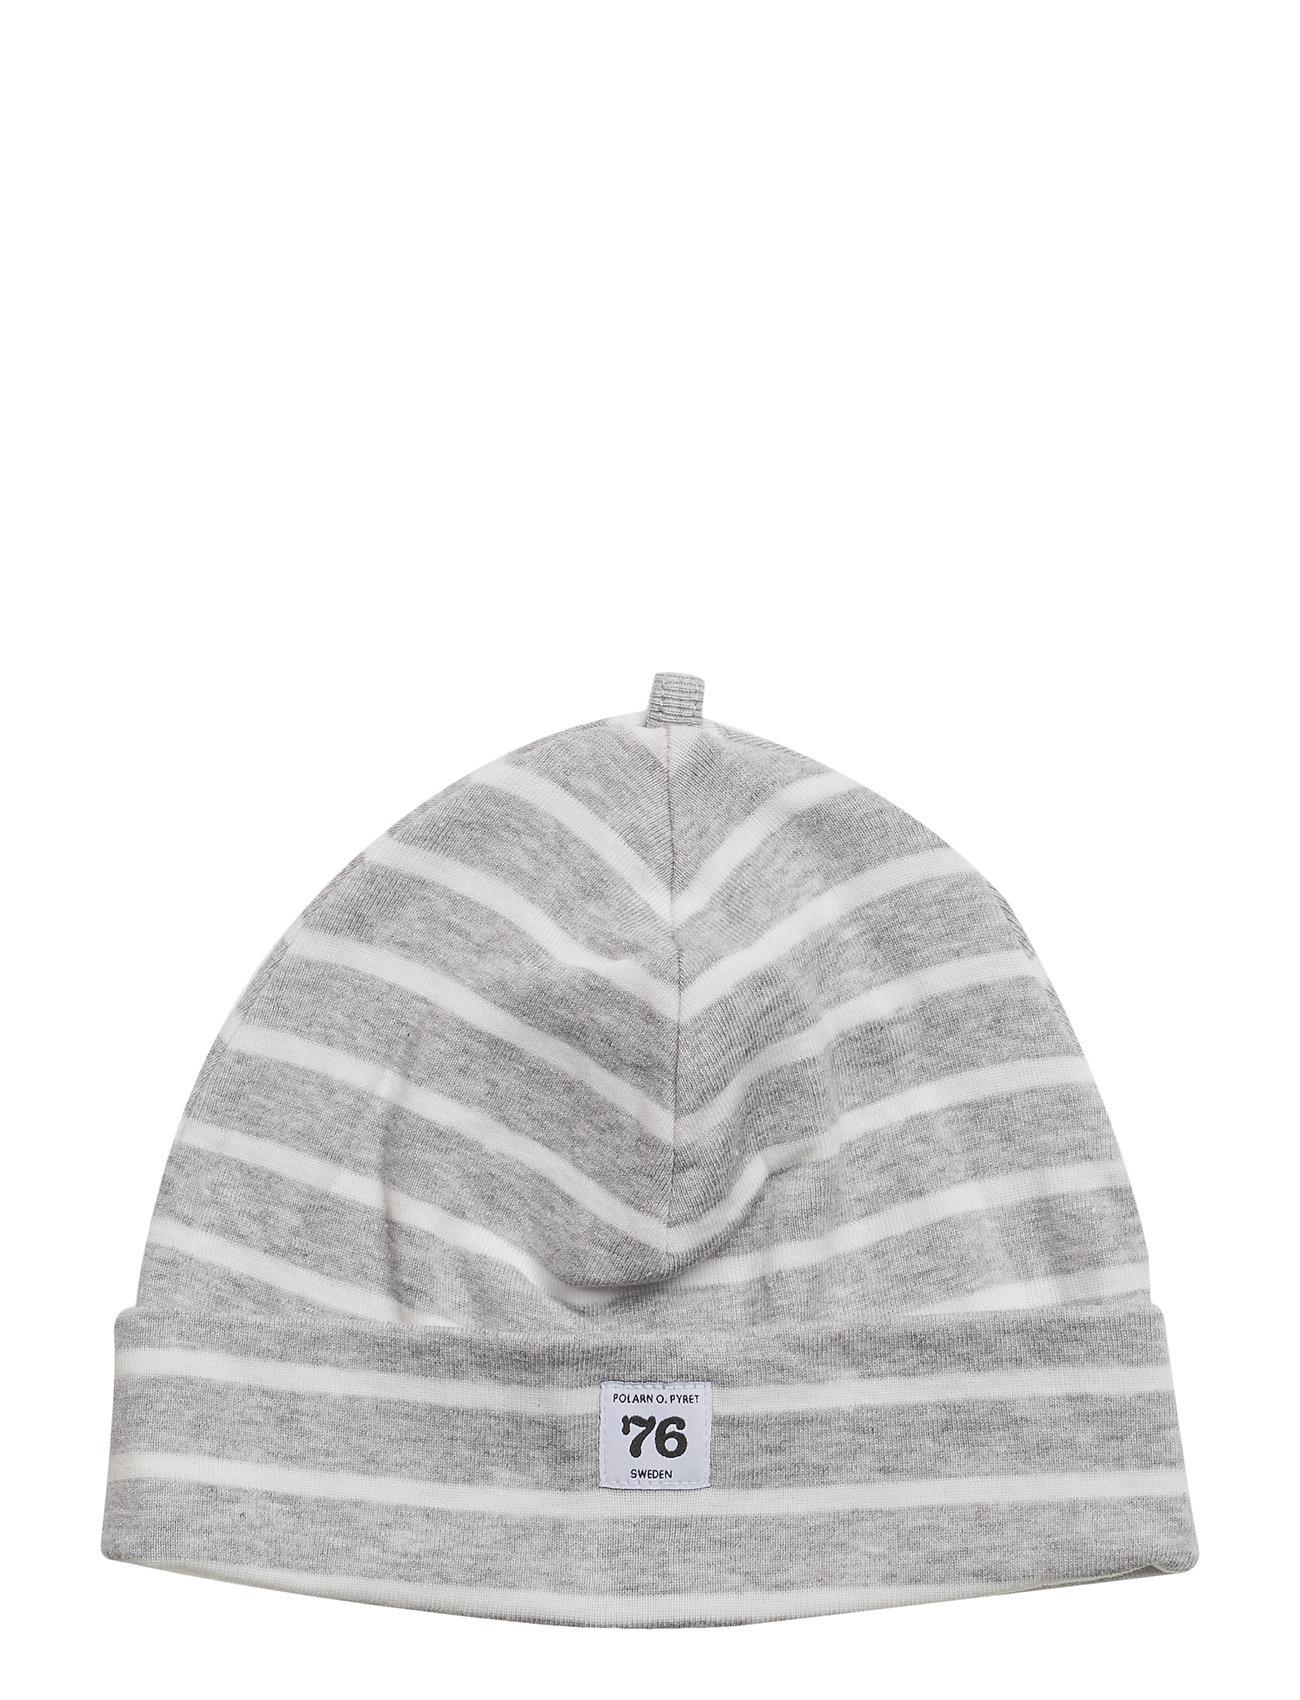 Polarn O. Pyret Cap PO.P Stripe - GREYMELANGE